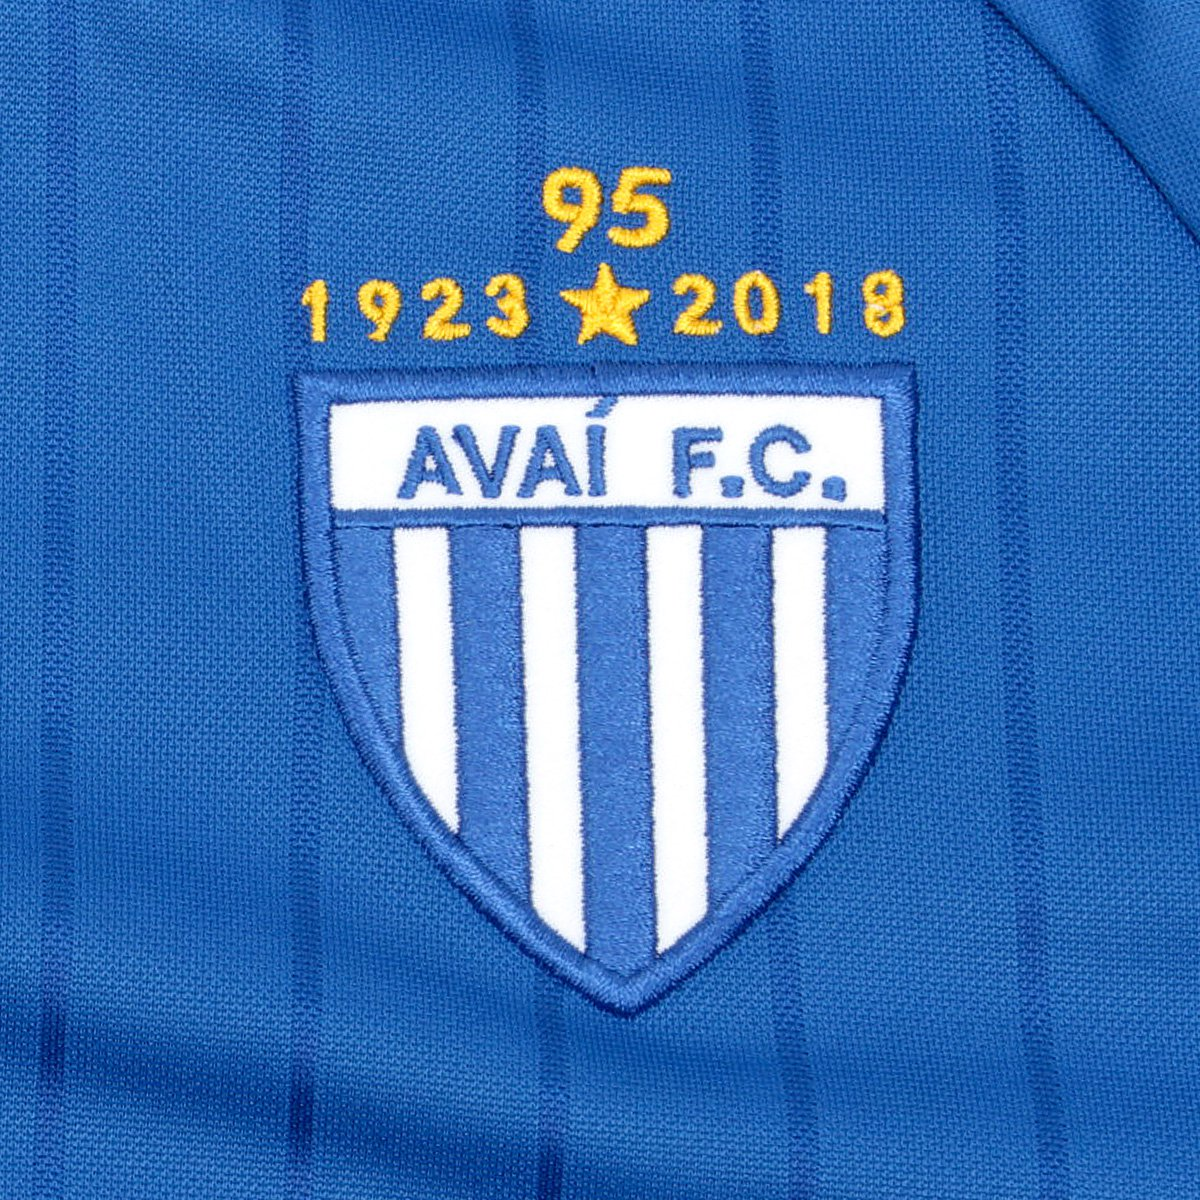 Camisa Avai Infantil III 2018 s n° Torcedor Umbro - Azul e Branco ... 8091ef5720b19